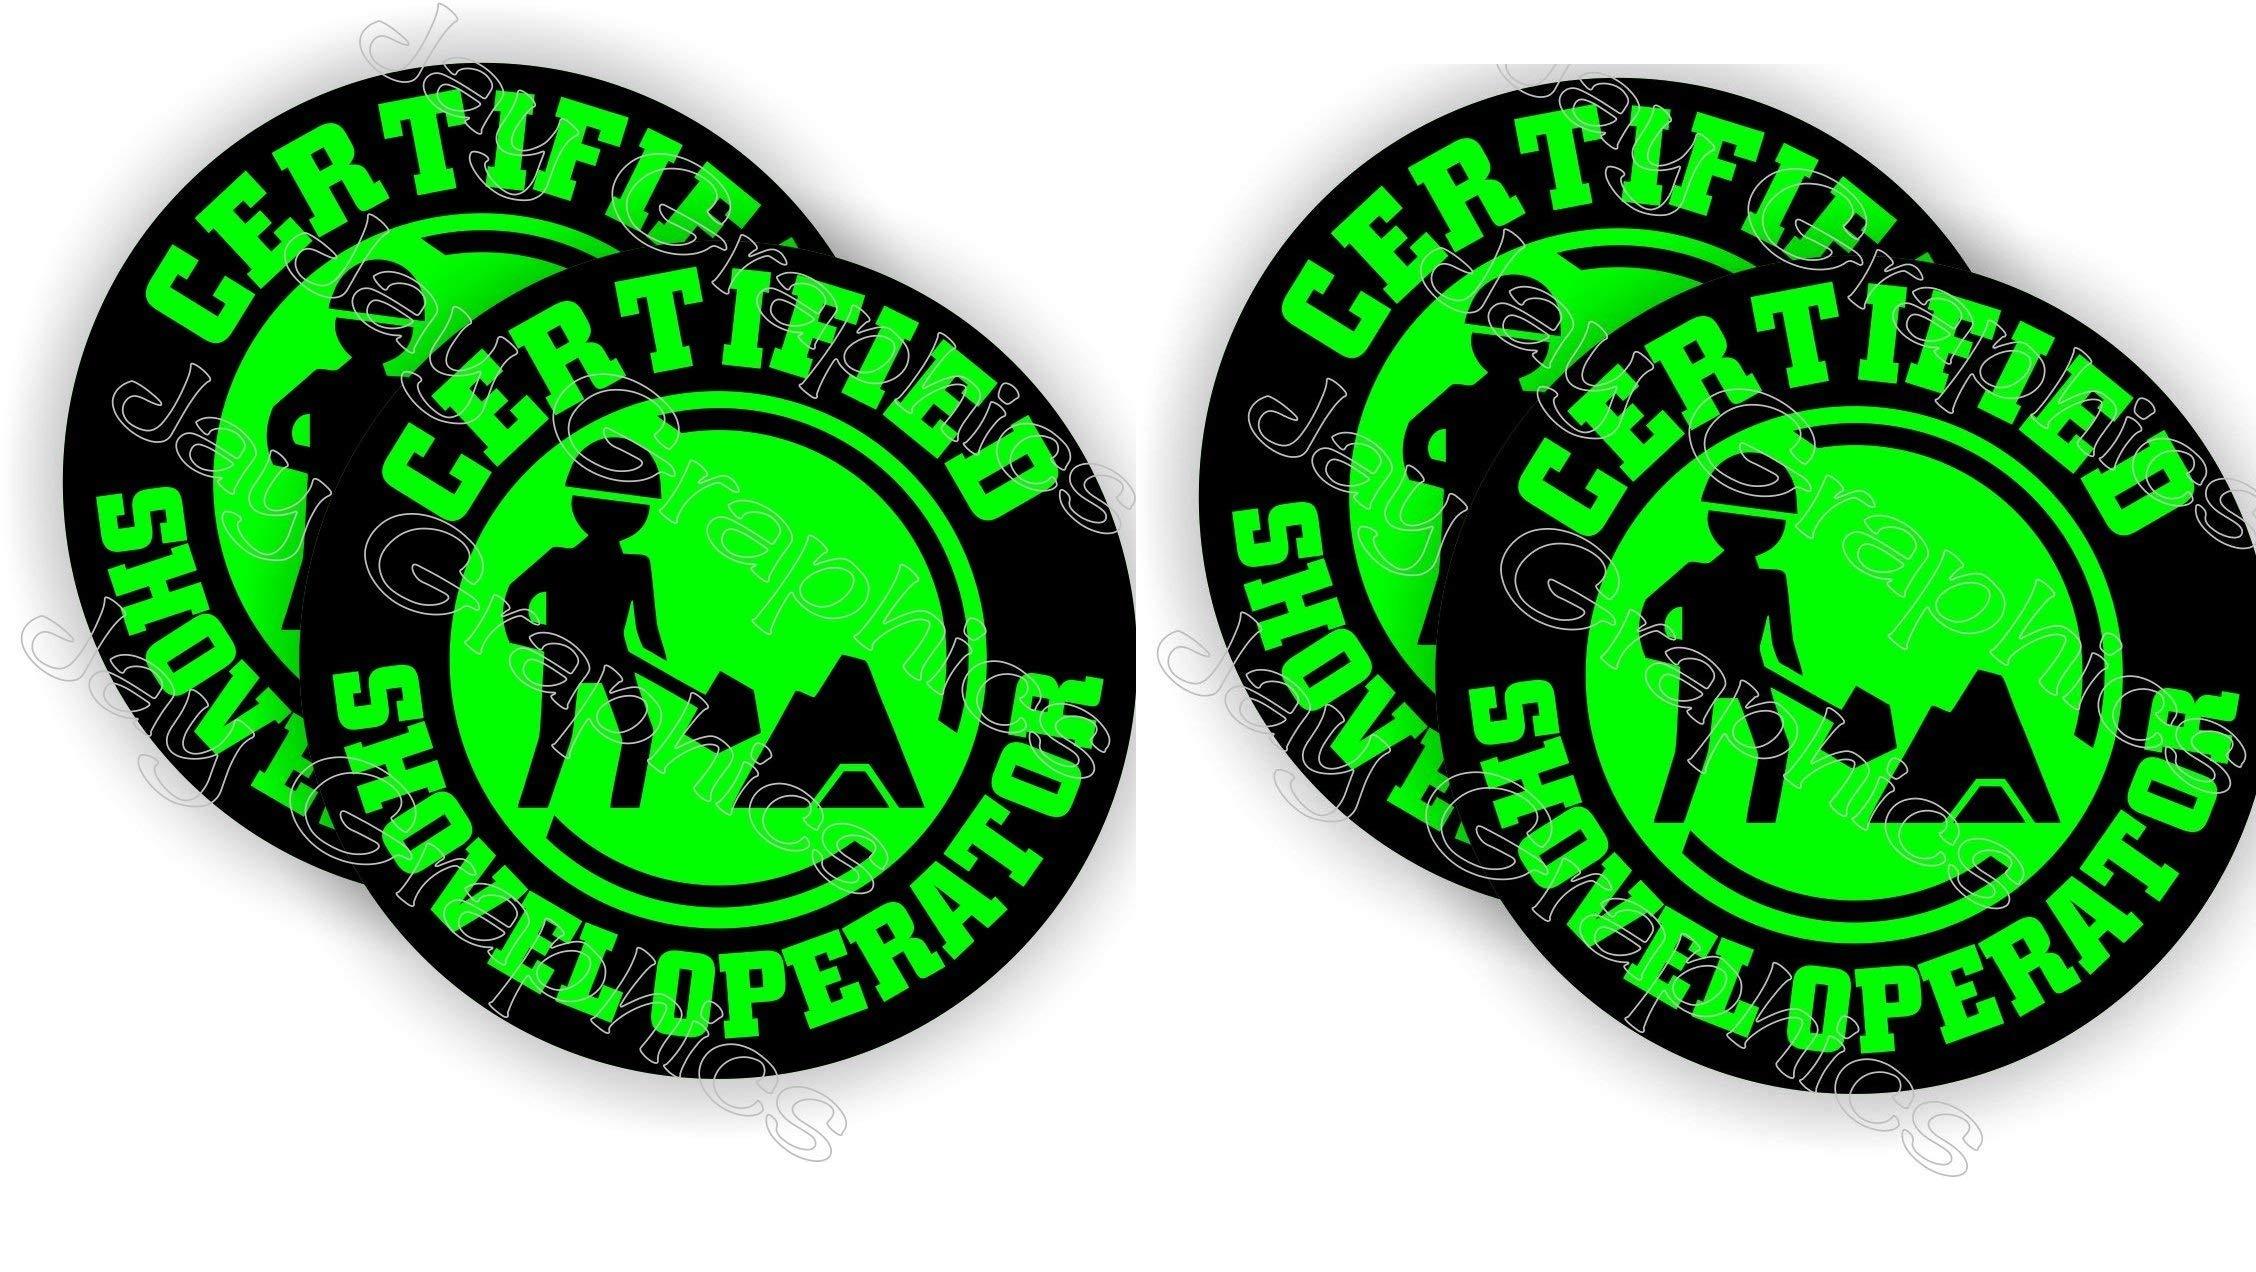 4 pieces SET   Certified SHOVEL OPERATOR   Hard Hat Sticker   Decal   Helmet Label Rude Funny